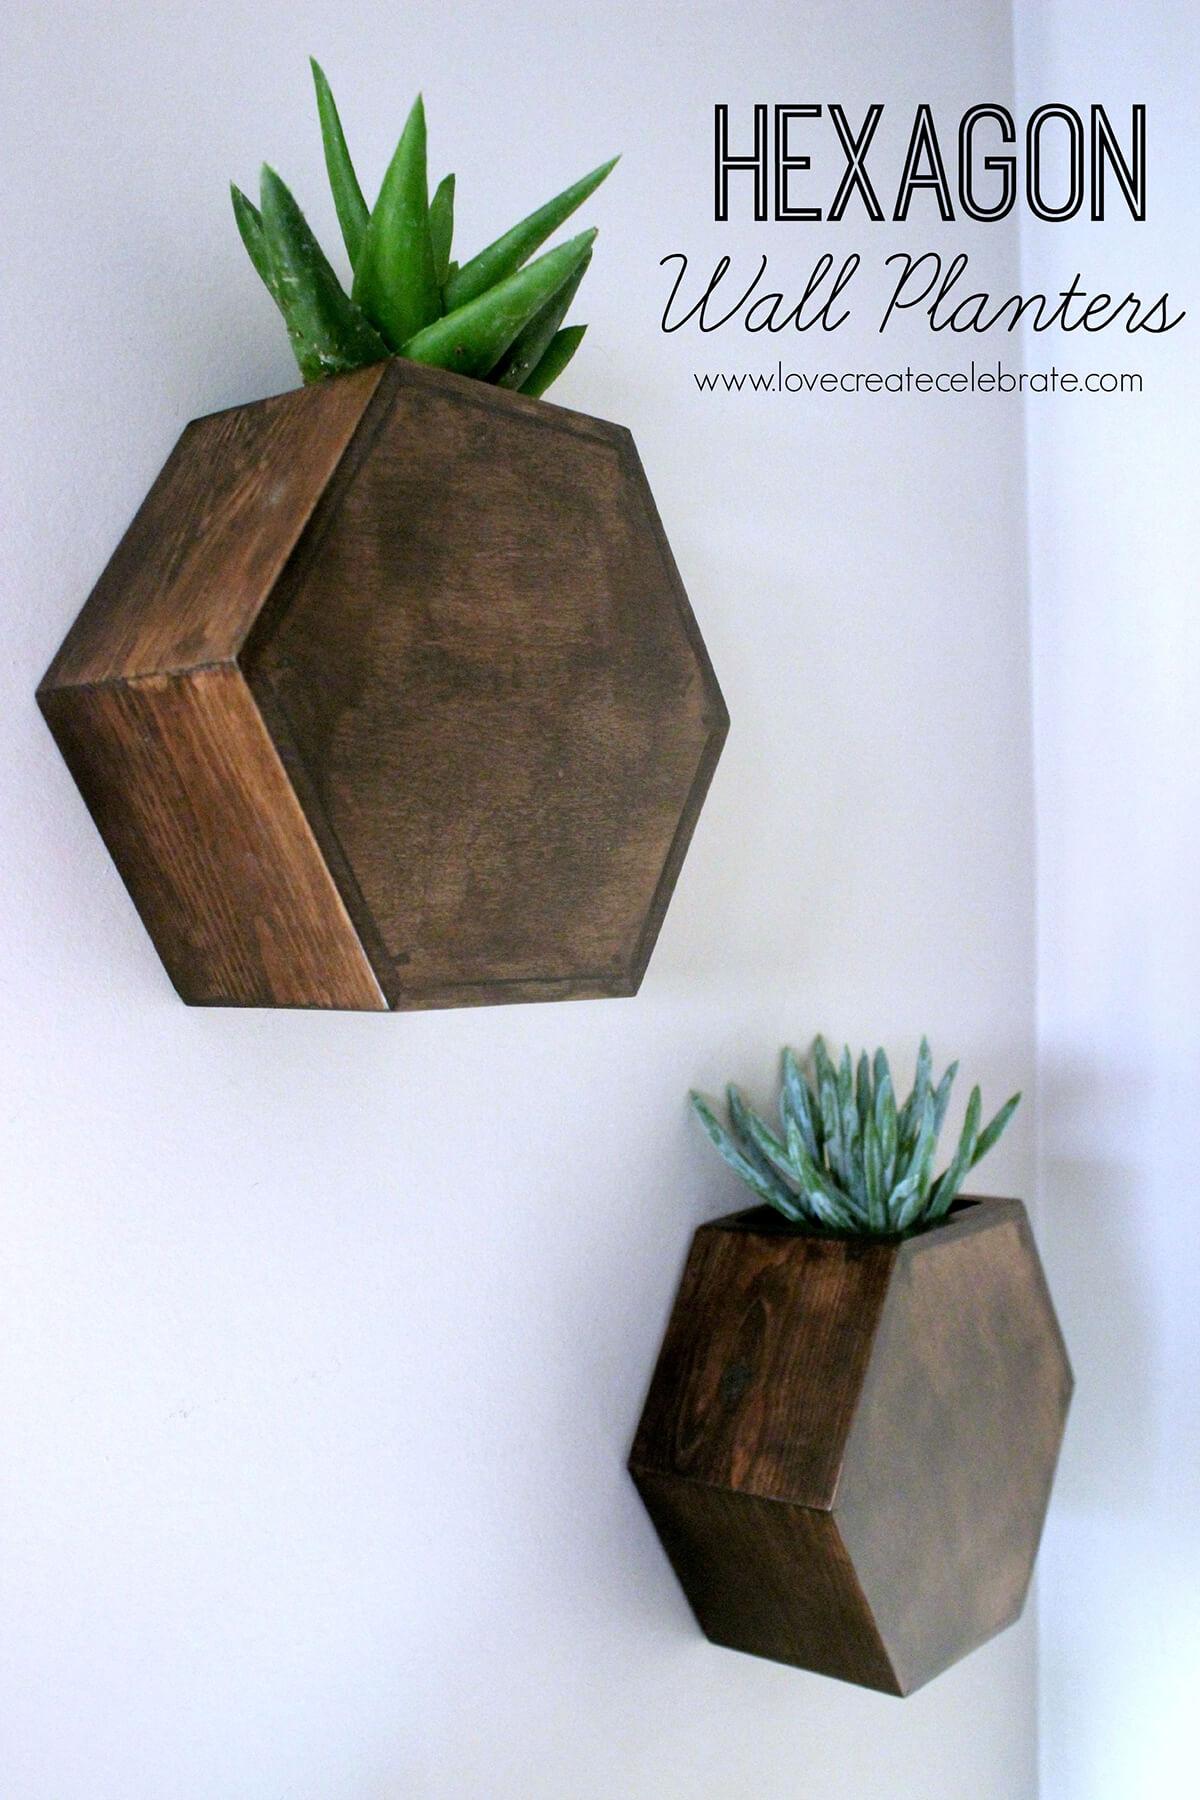 Modern Style Hexagonal Wall Planters